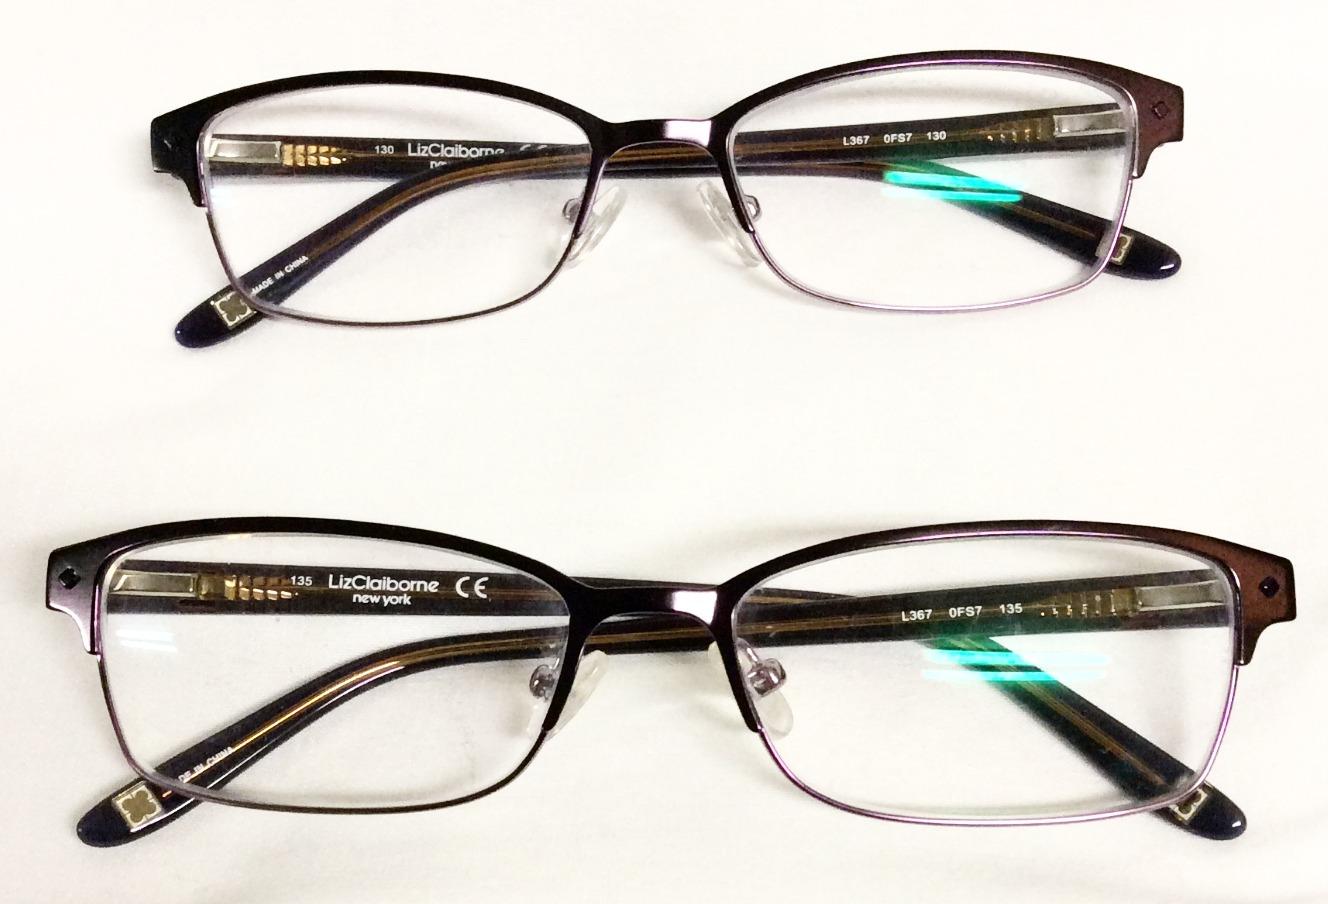 ALR Eyeglasses